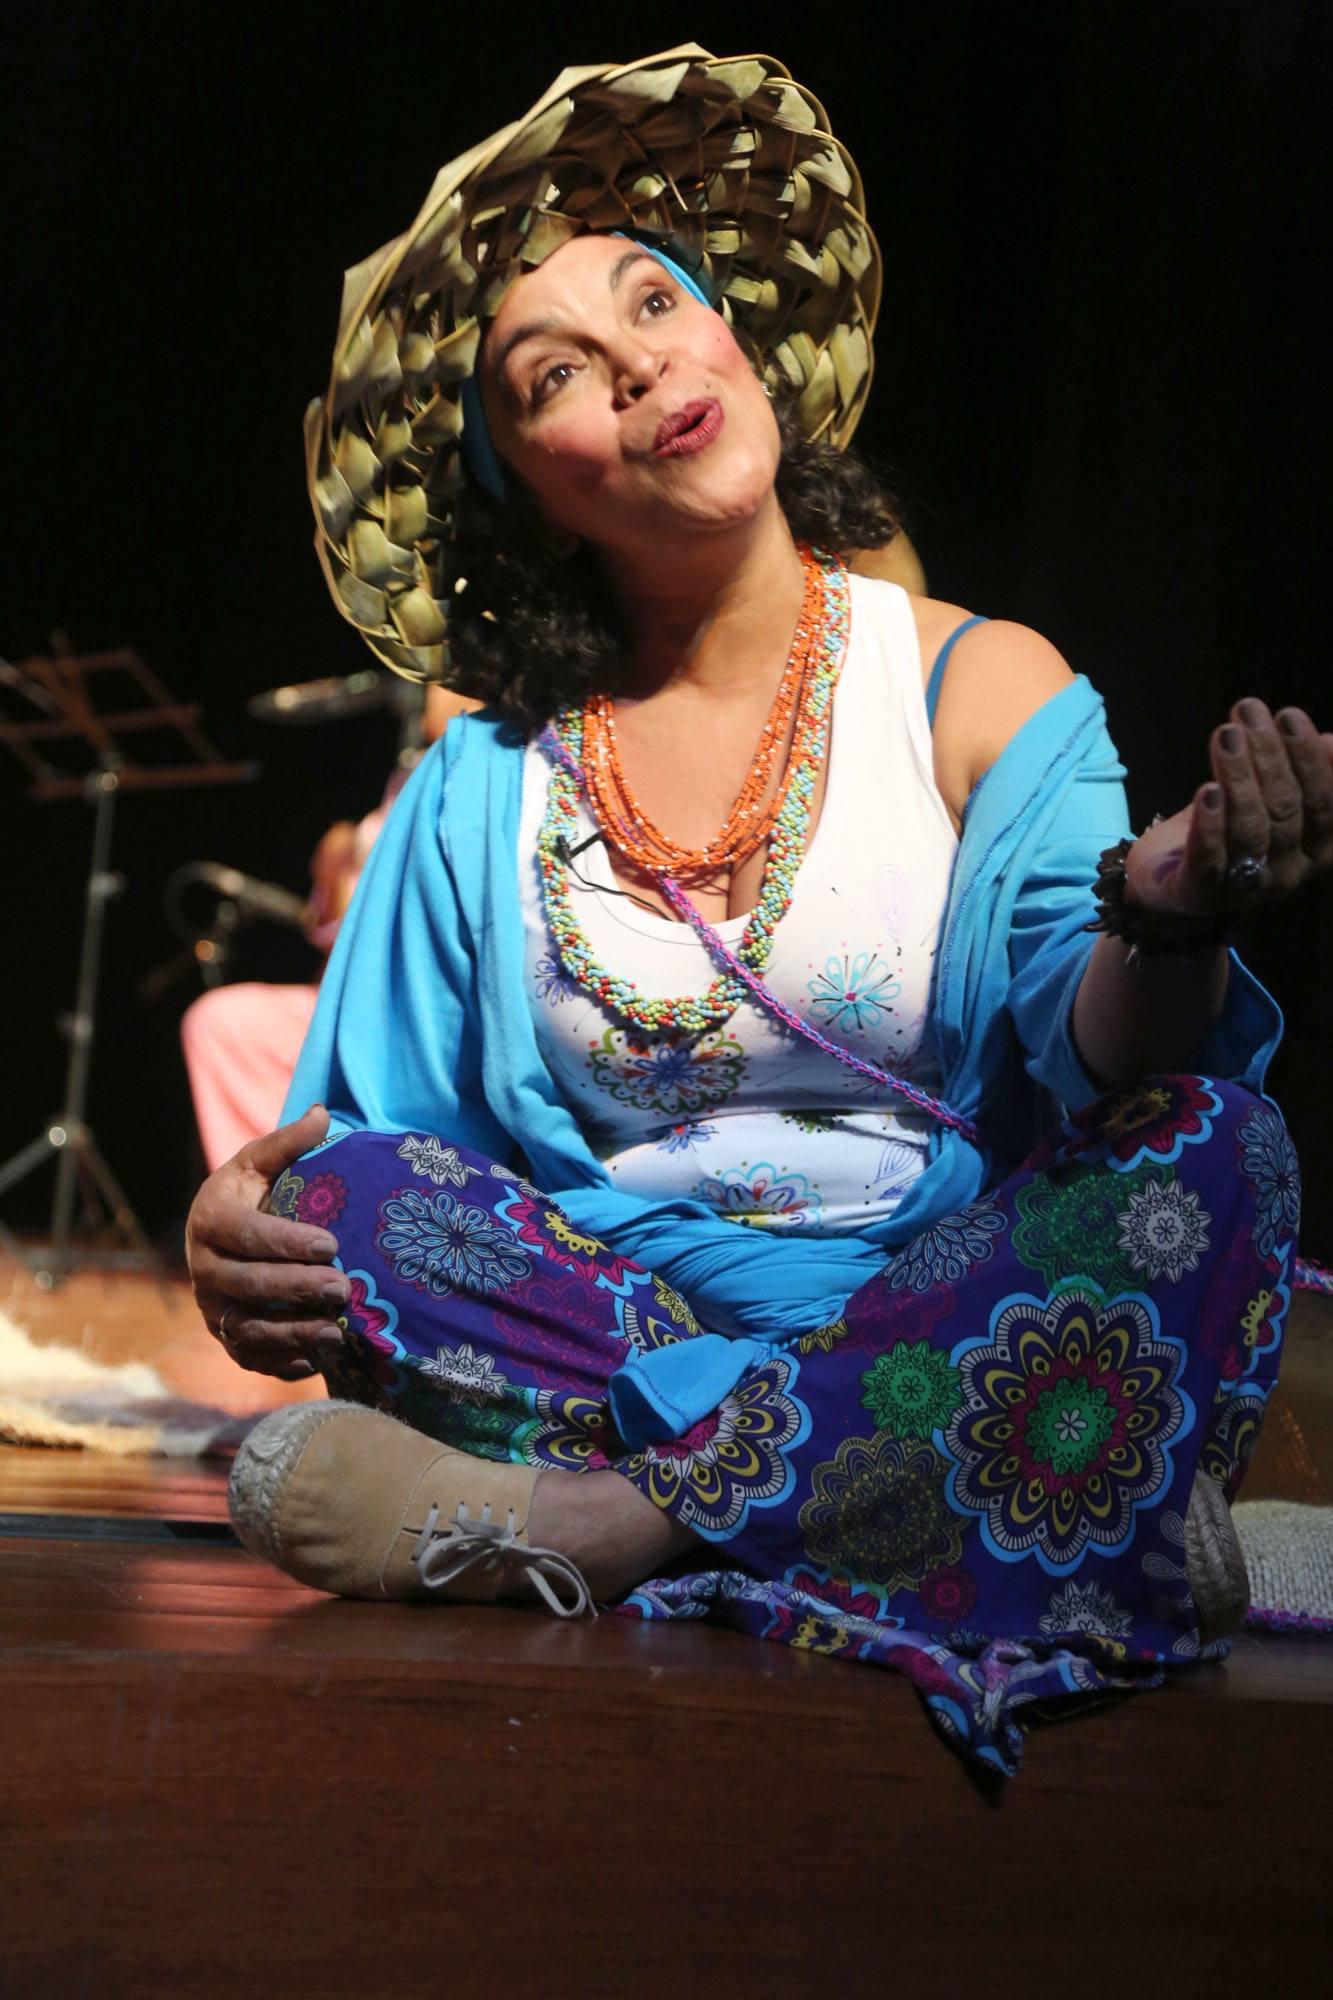 Livia Méndez